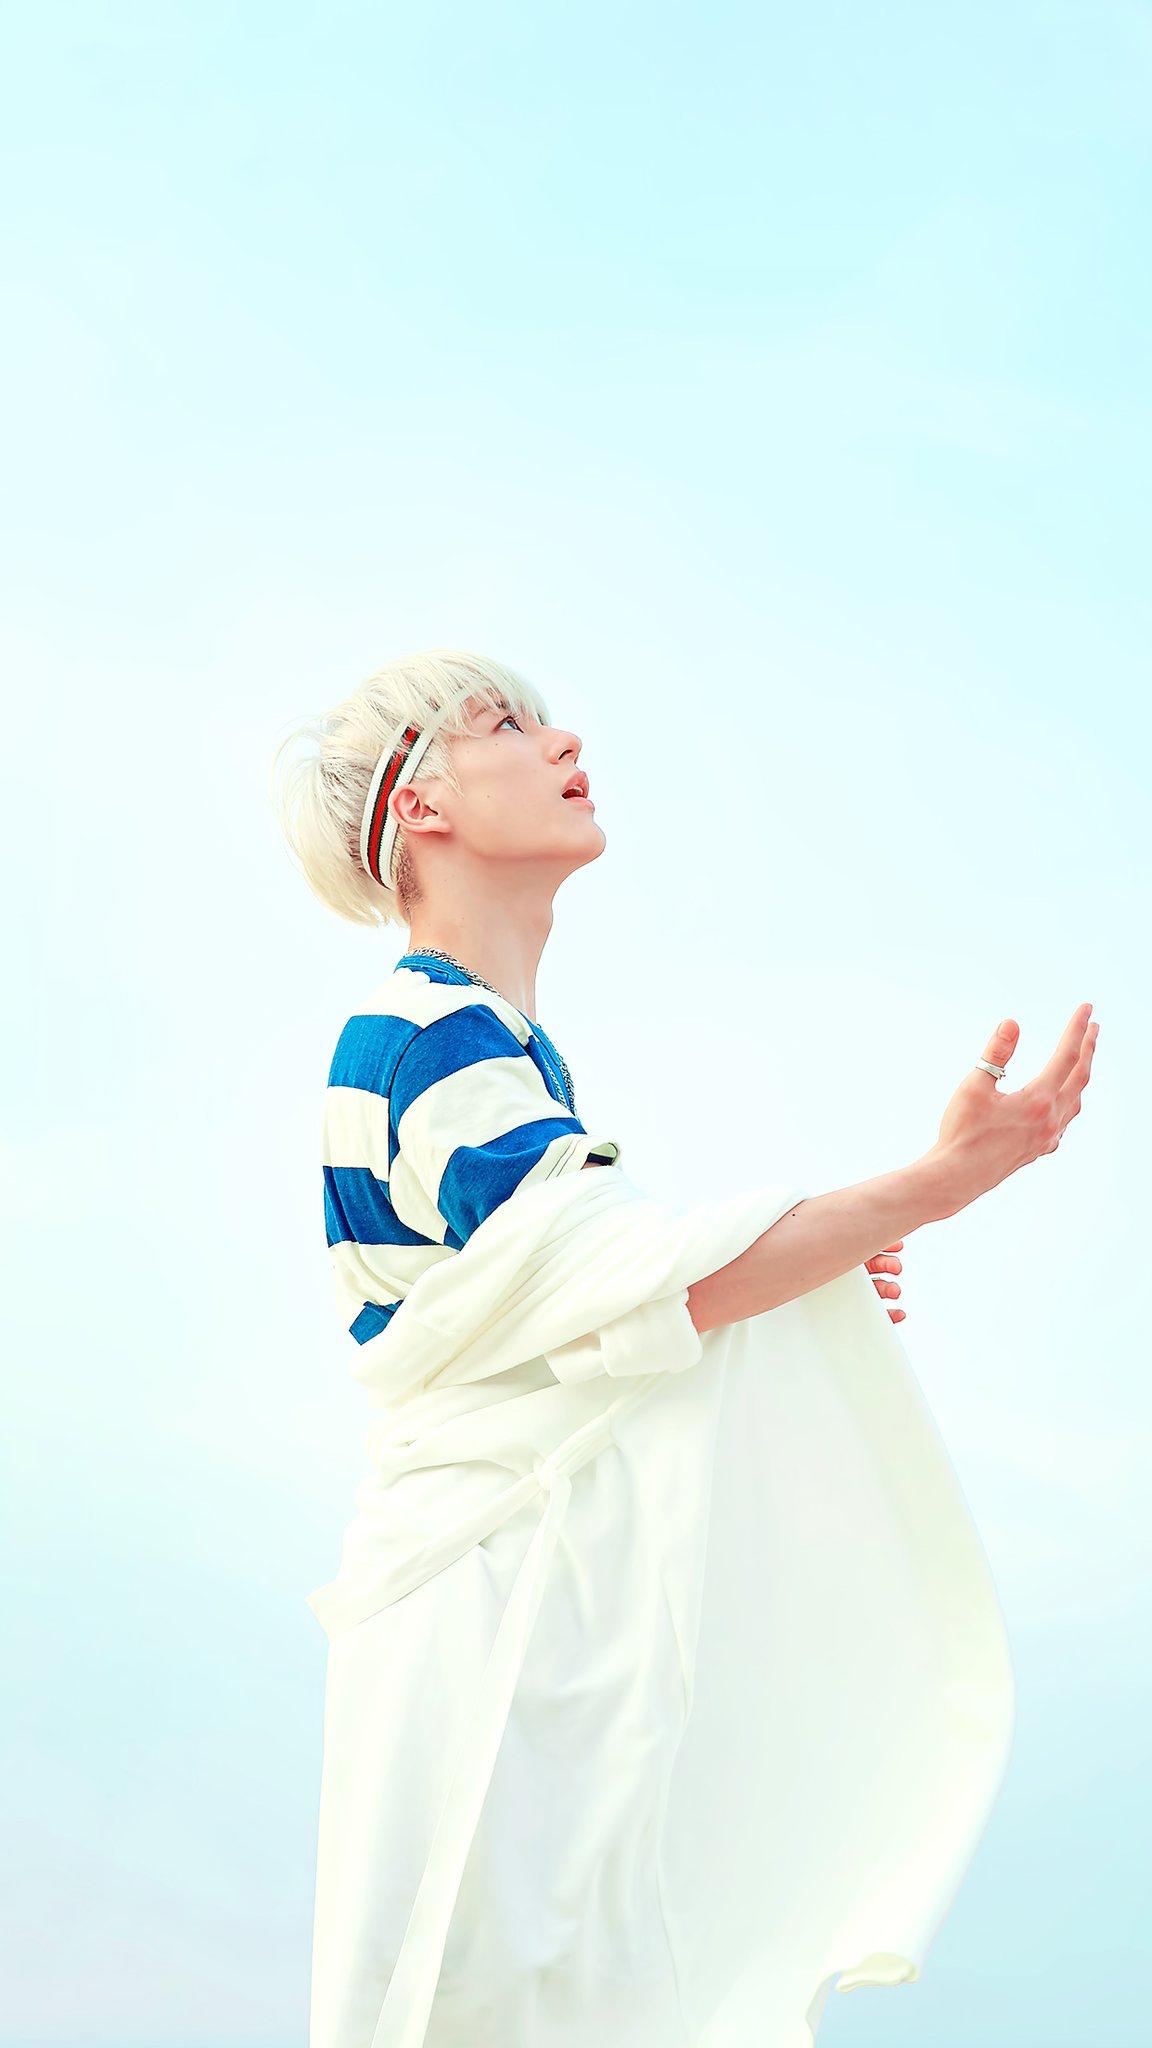 Pin oleh tokki di nct | NCT, Nct dream we young, dan Jeno nct